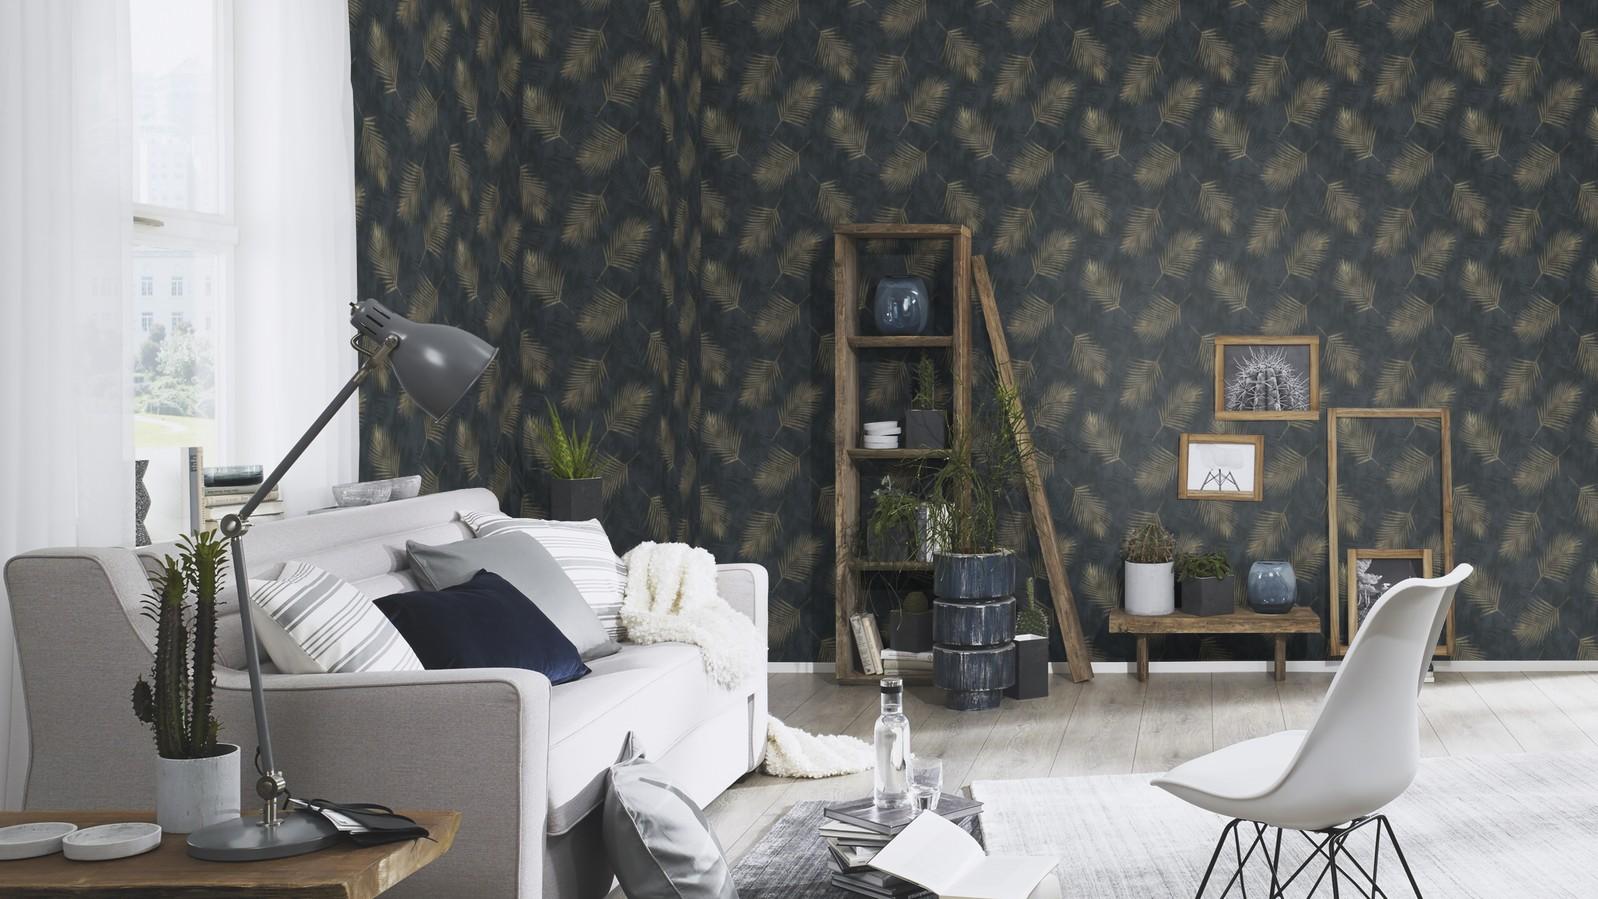 Обои Erismann GMK Fashion for Walls New 02579-40 (Эрисман)